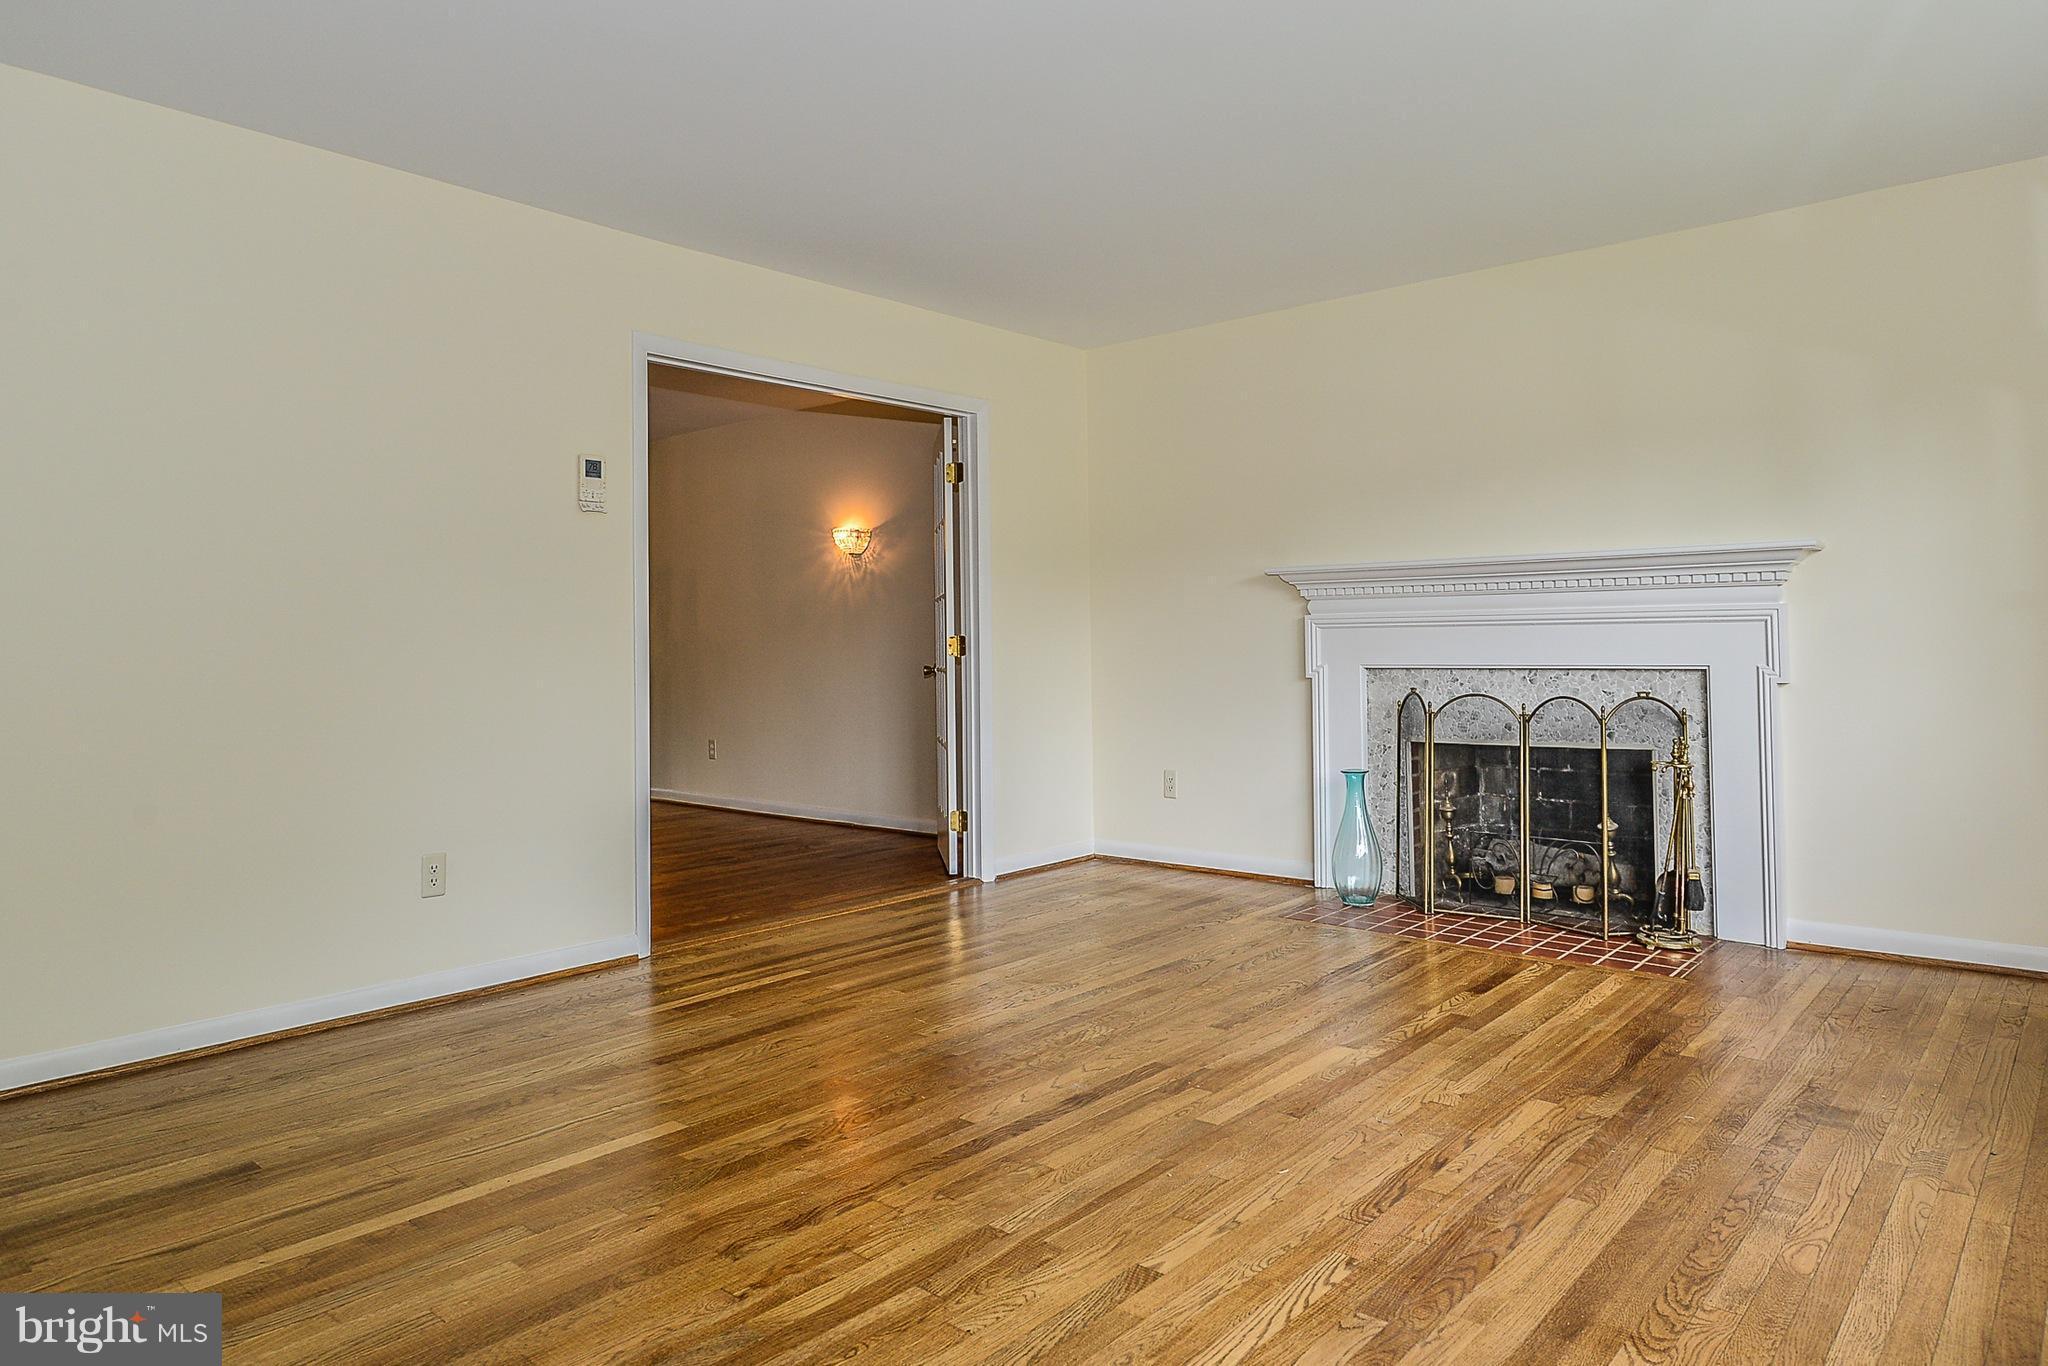 OLD CREEK DRIVE Fairfax VA SOLD LISTING MLS - Dbm hardwood flooring